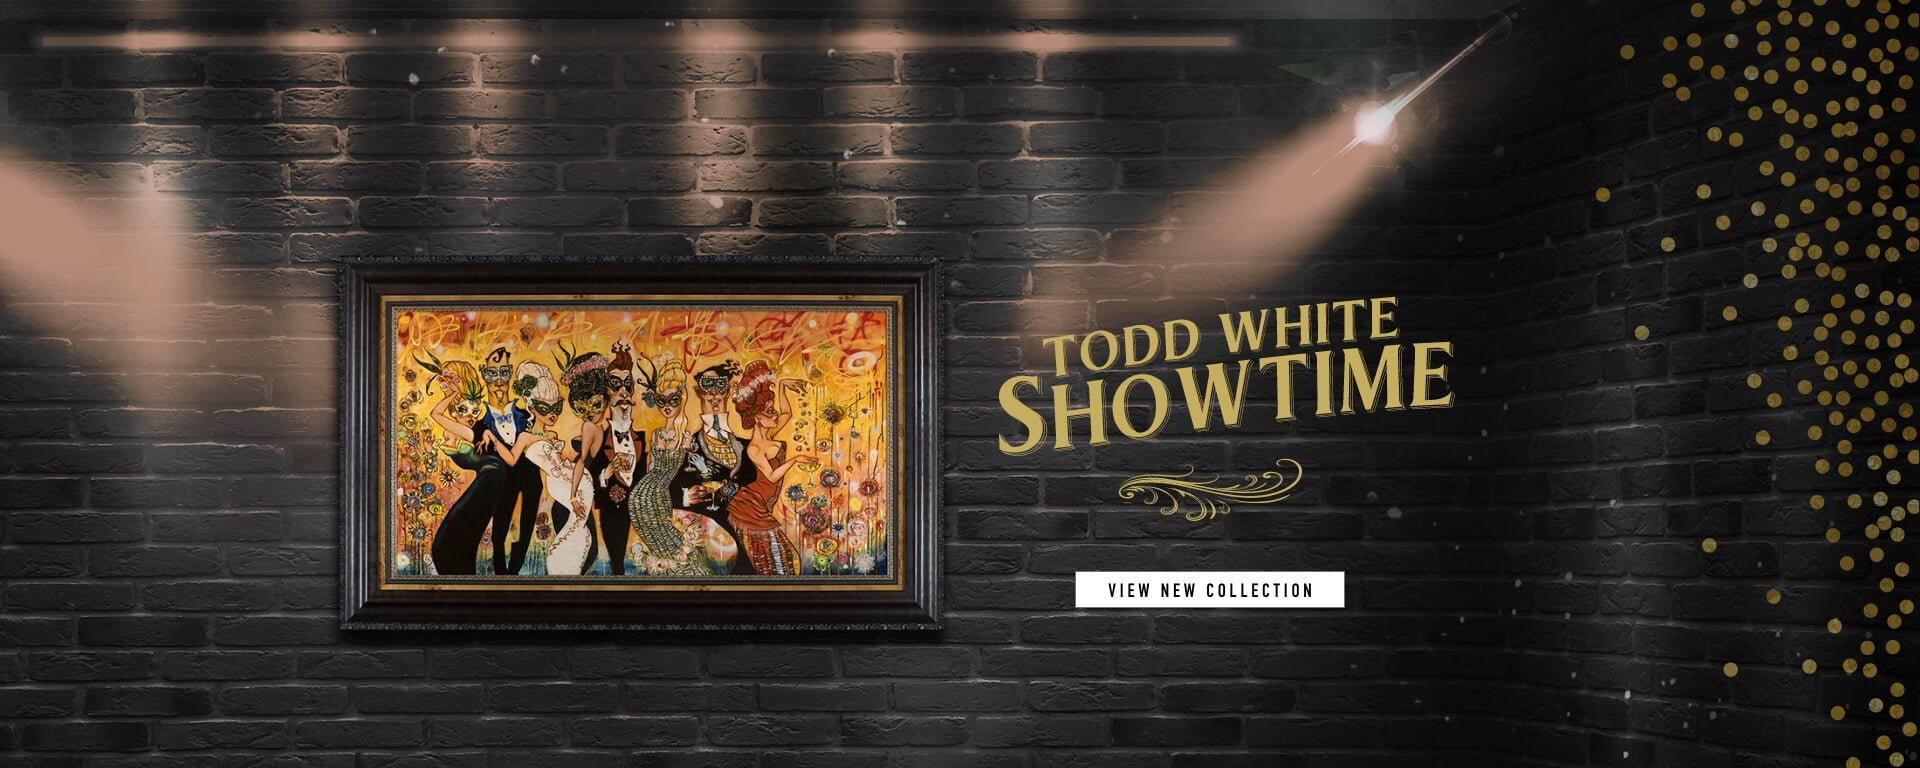 Todd White | Showtime